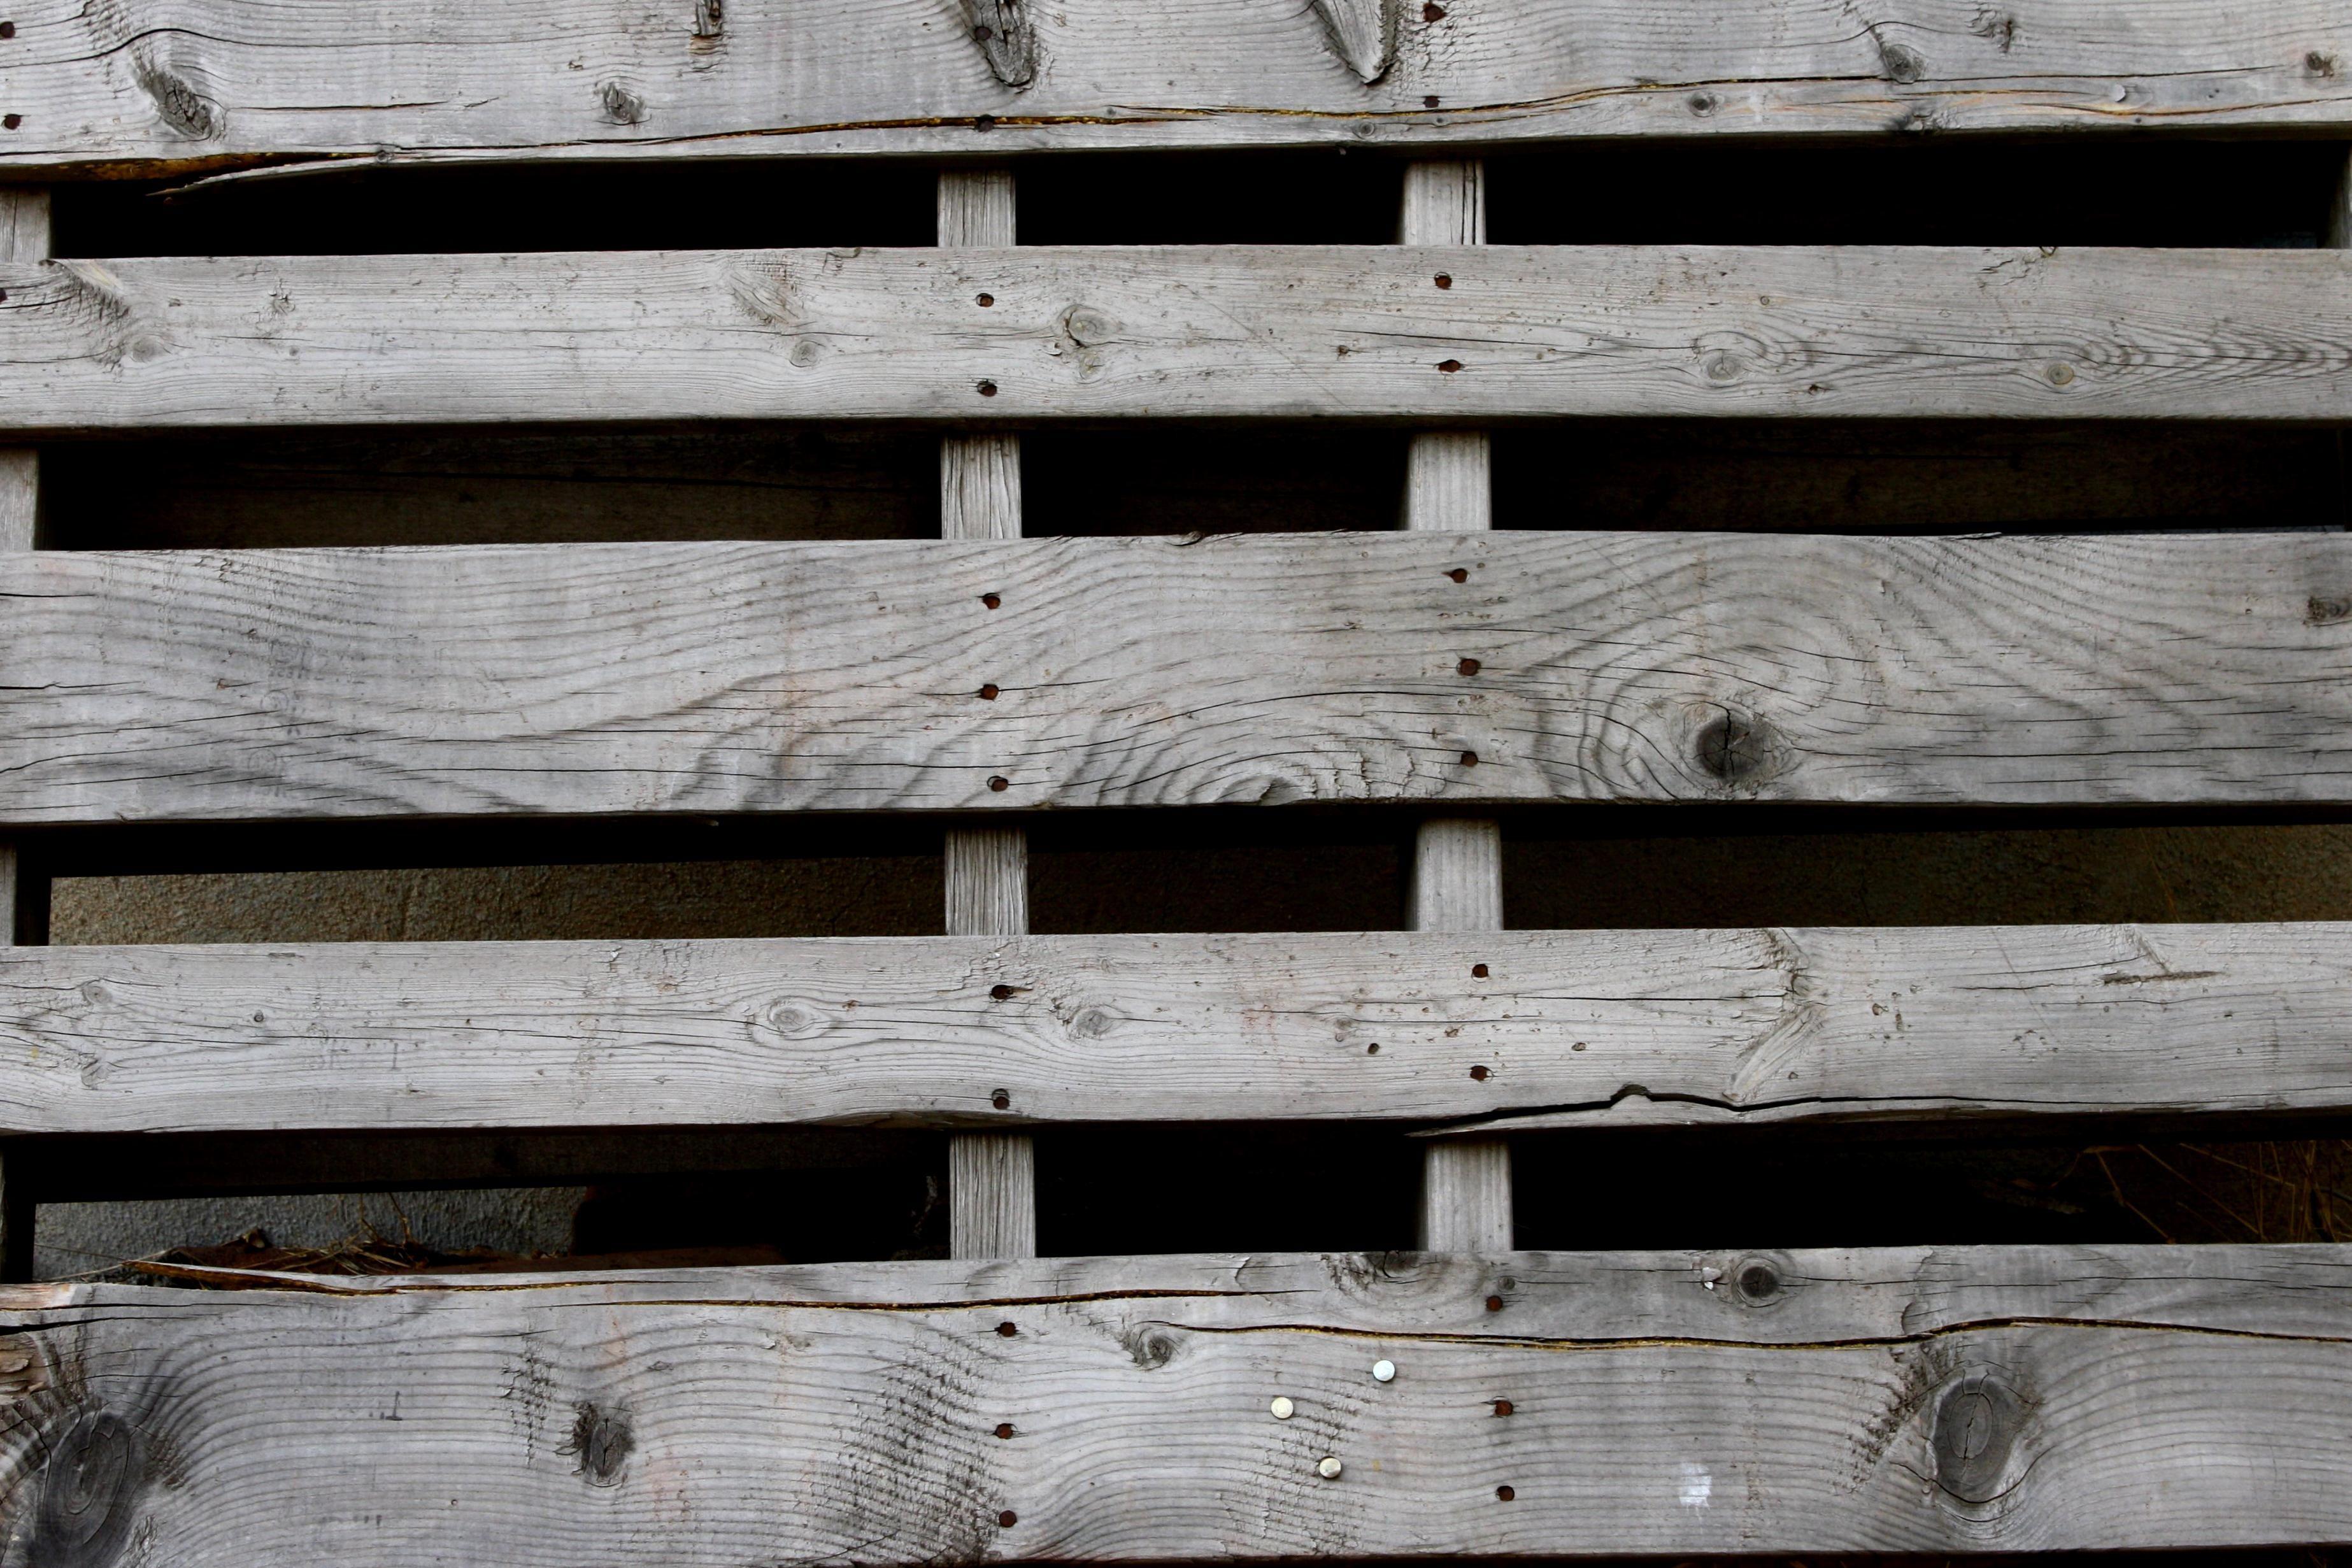 Old Wooden Pallet Planks Pattern